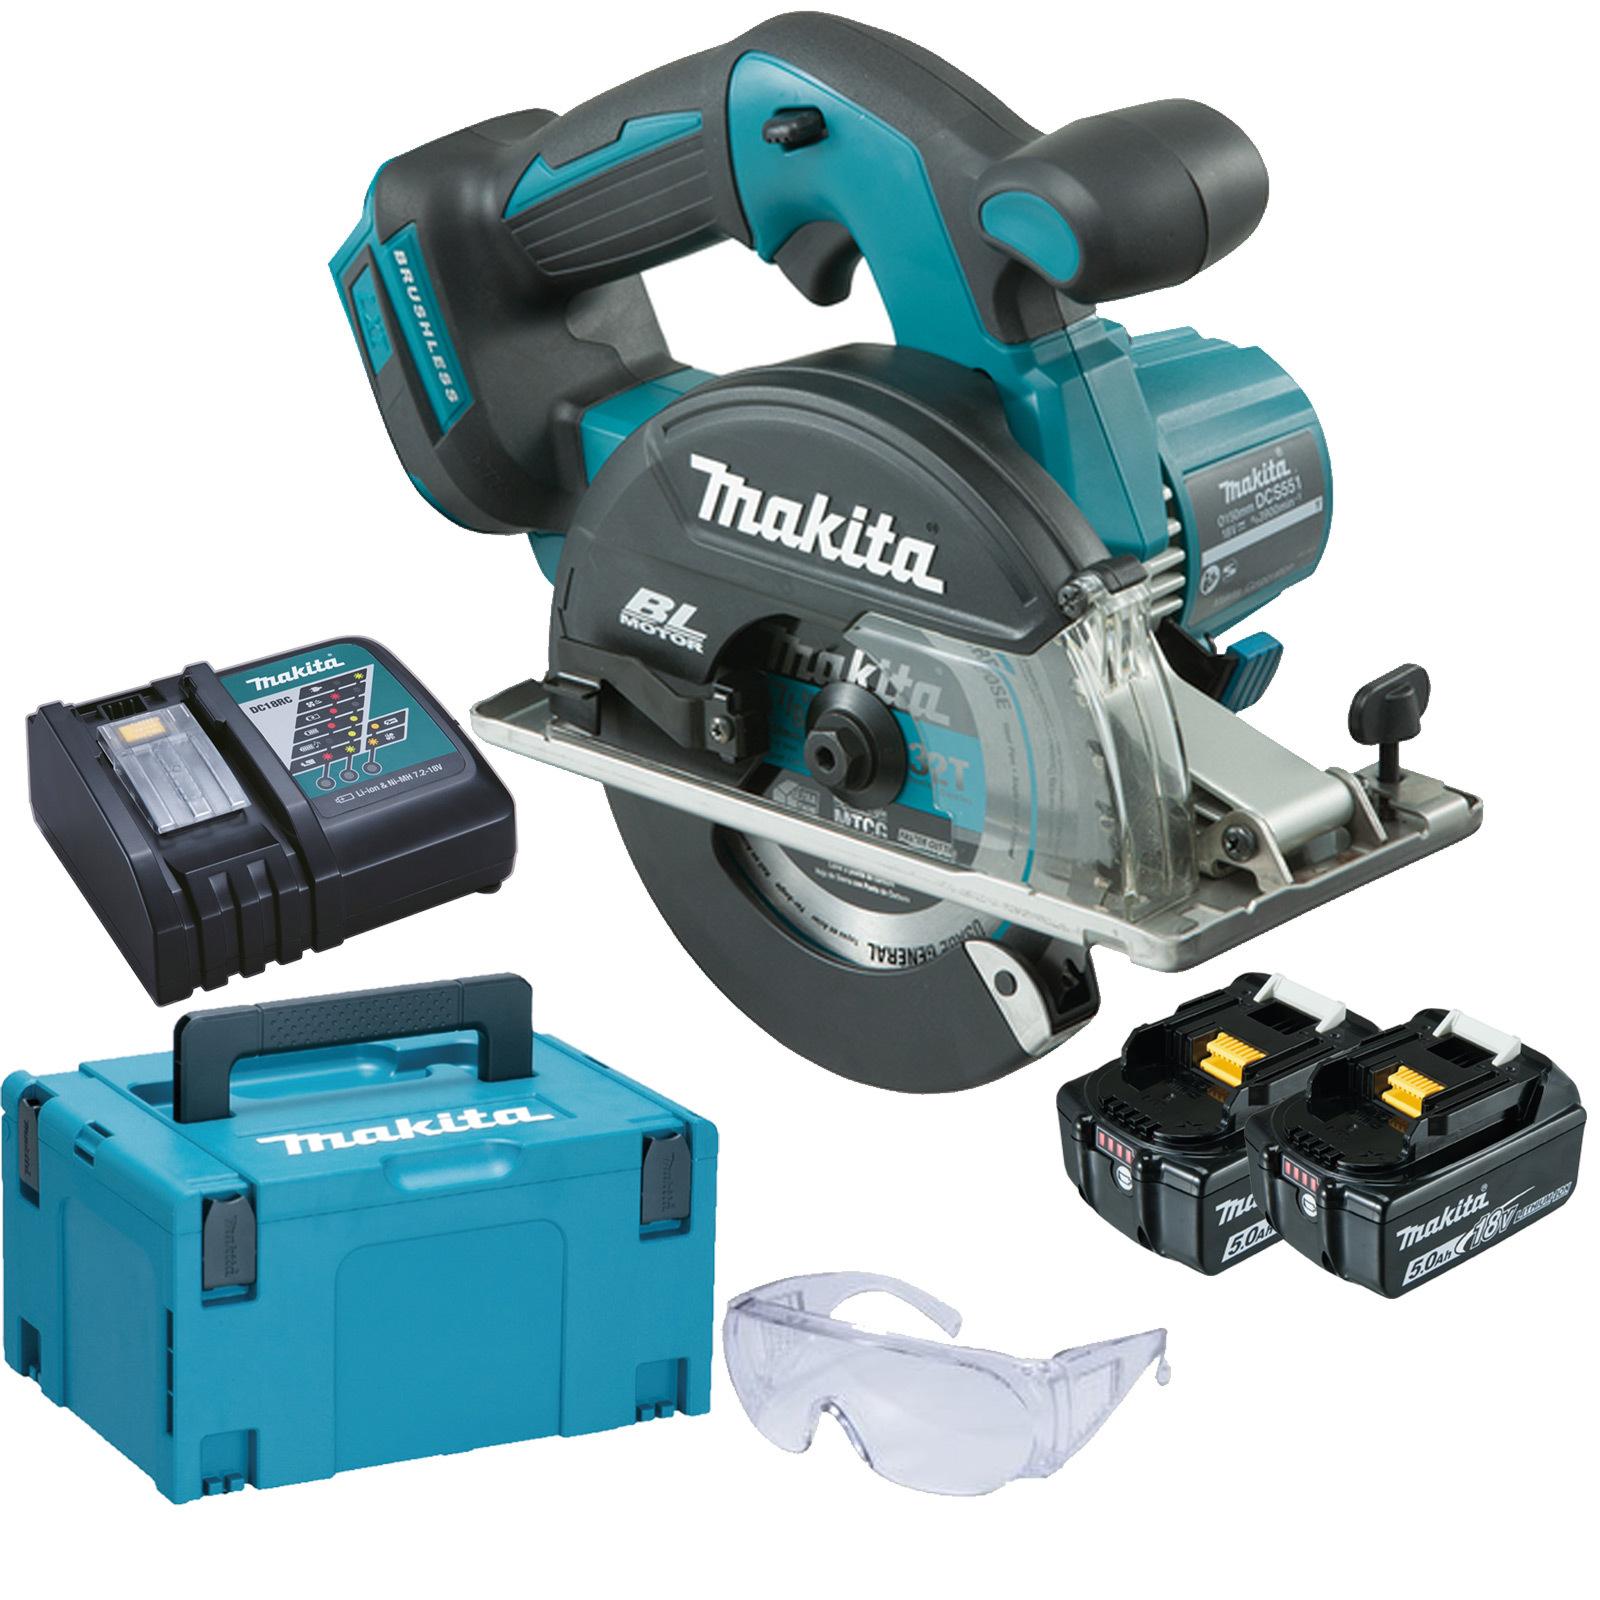 makita 18v cordless brushless 150mm 6 metal circular saw my power tools. Black Bedroom Furniture Sets. Home Design Ideas